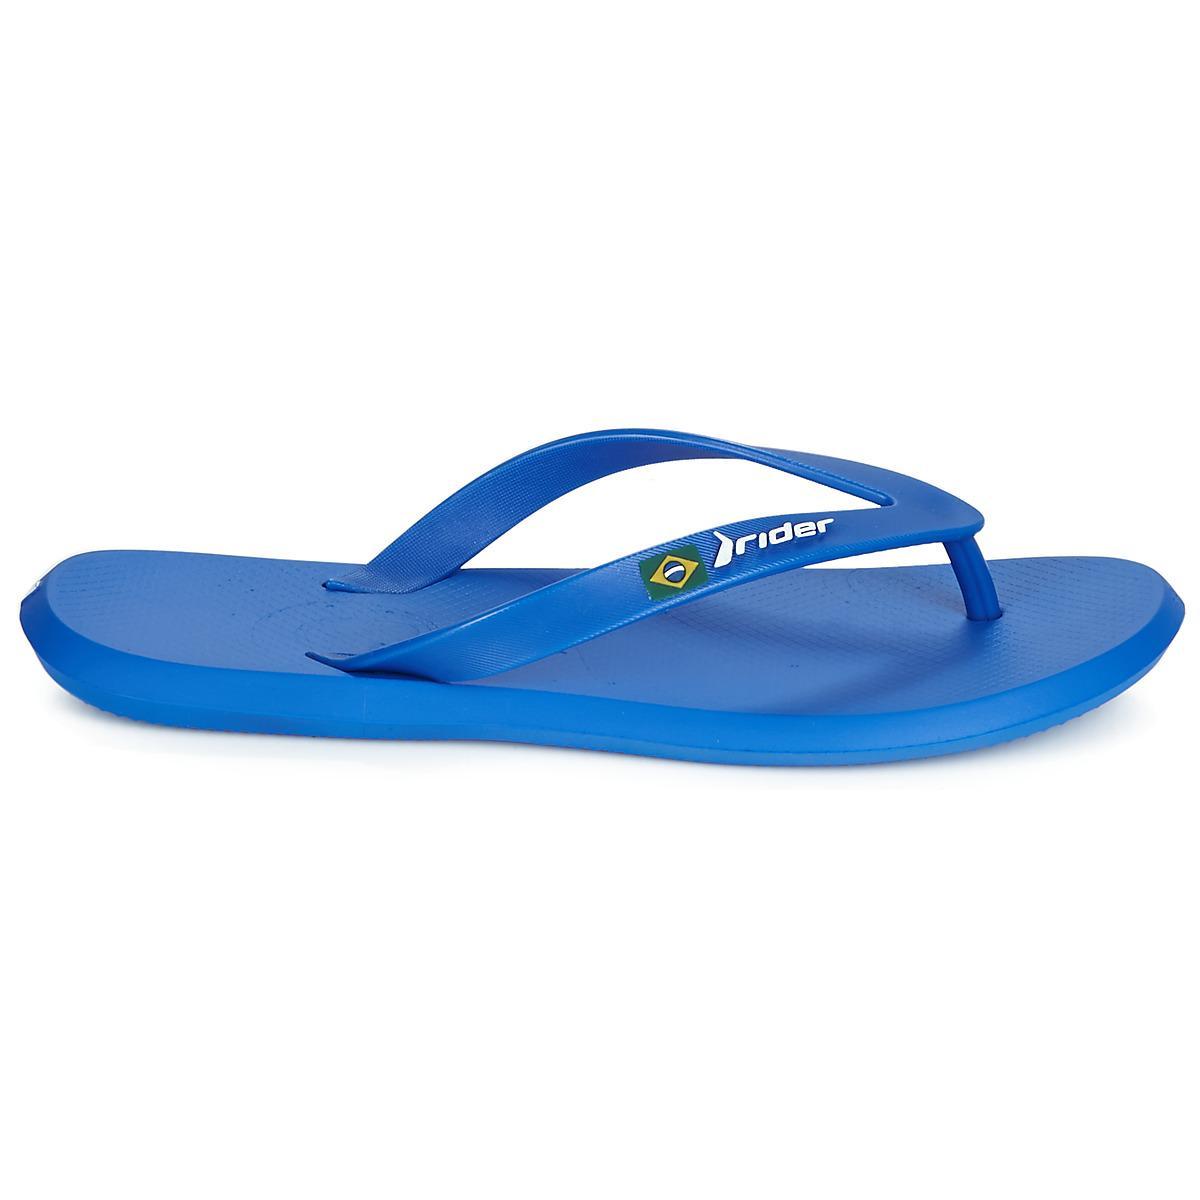 15935464c1f027 Rider - Blue R1 Flip Flops   Sandals (shoes) for Men - Lyst. View fullscreen